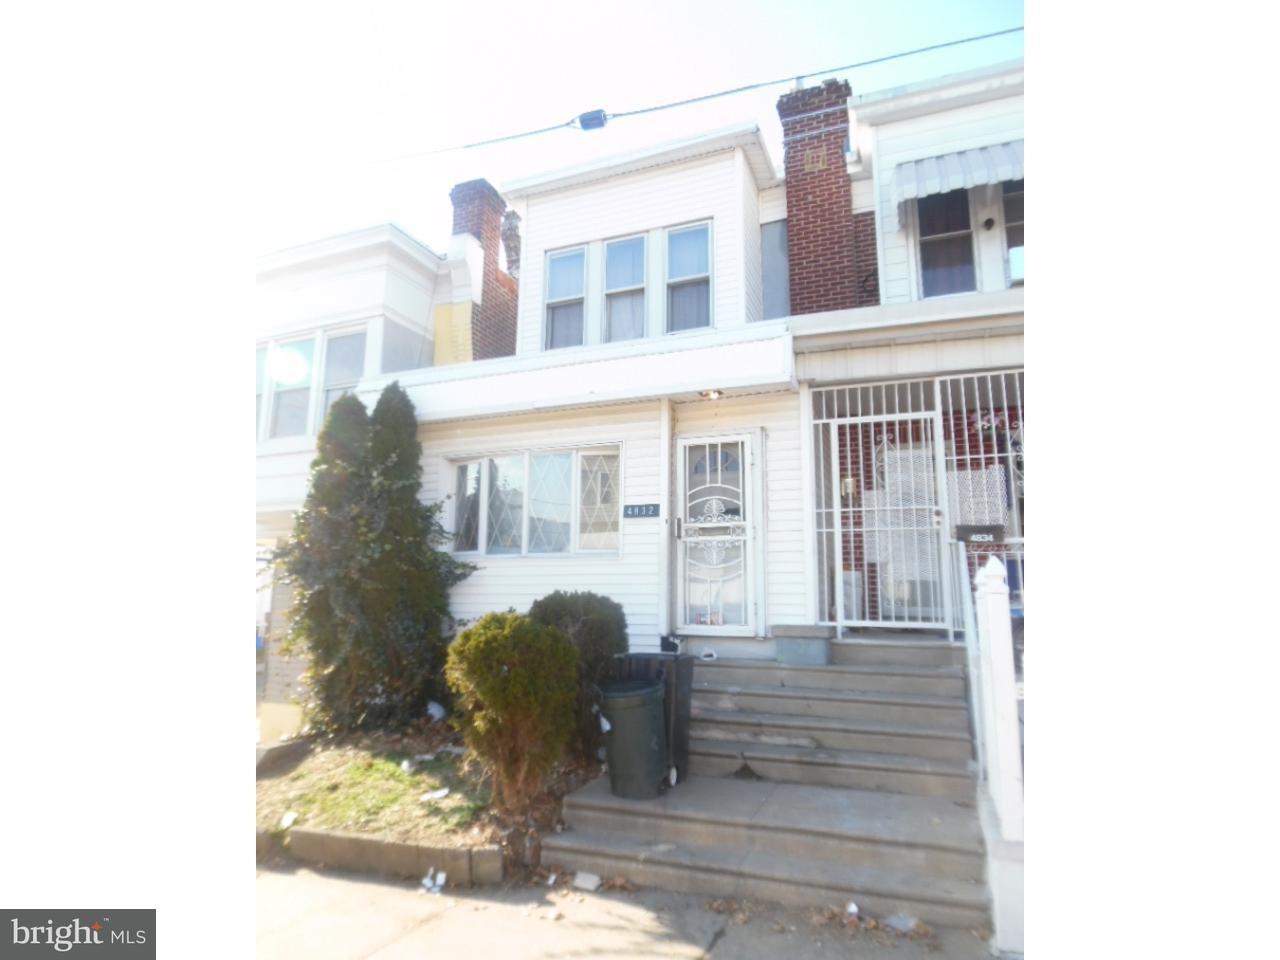 4832  B Philadelphia , PA 19120